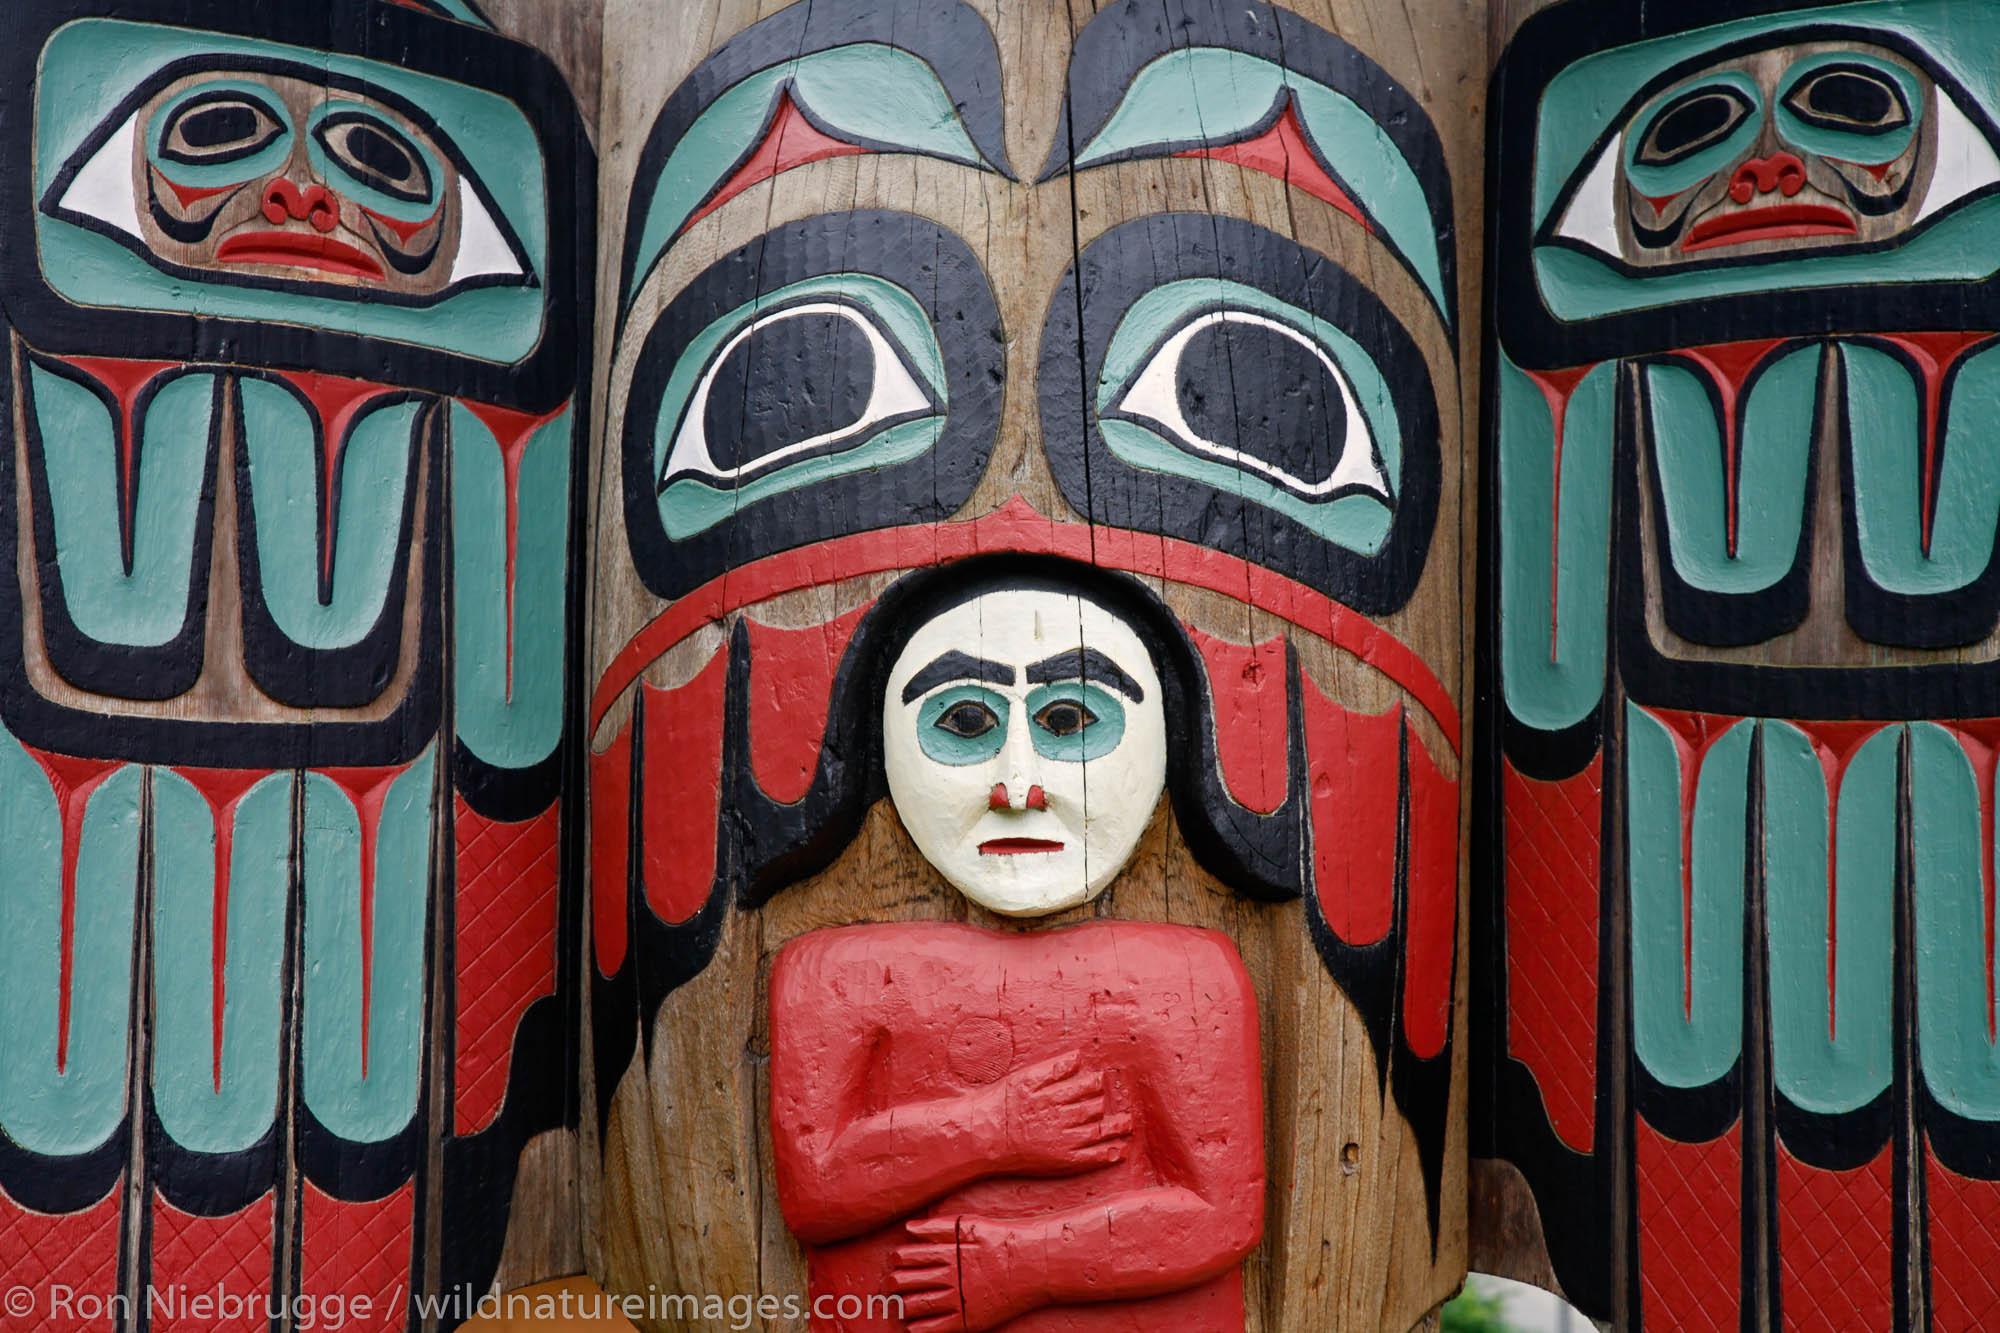 Saxman Totem Park, Ketchikan, Alaska.